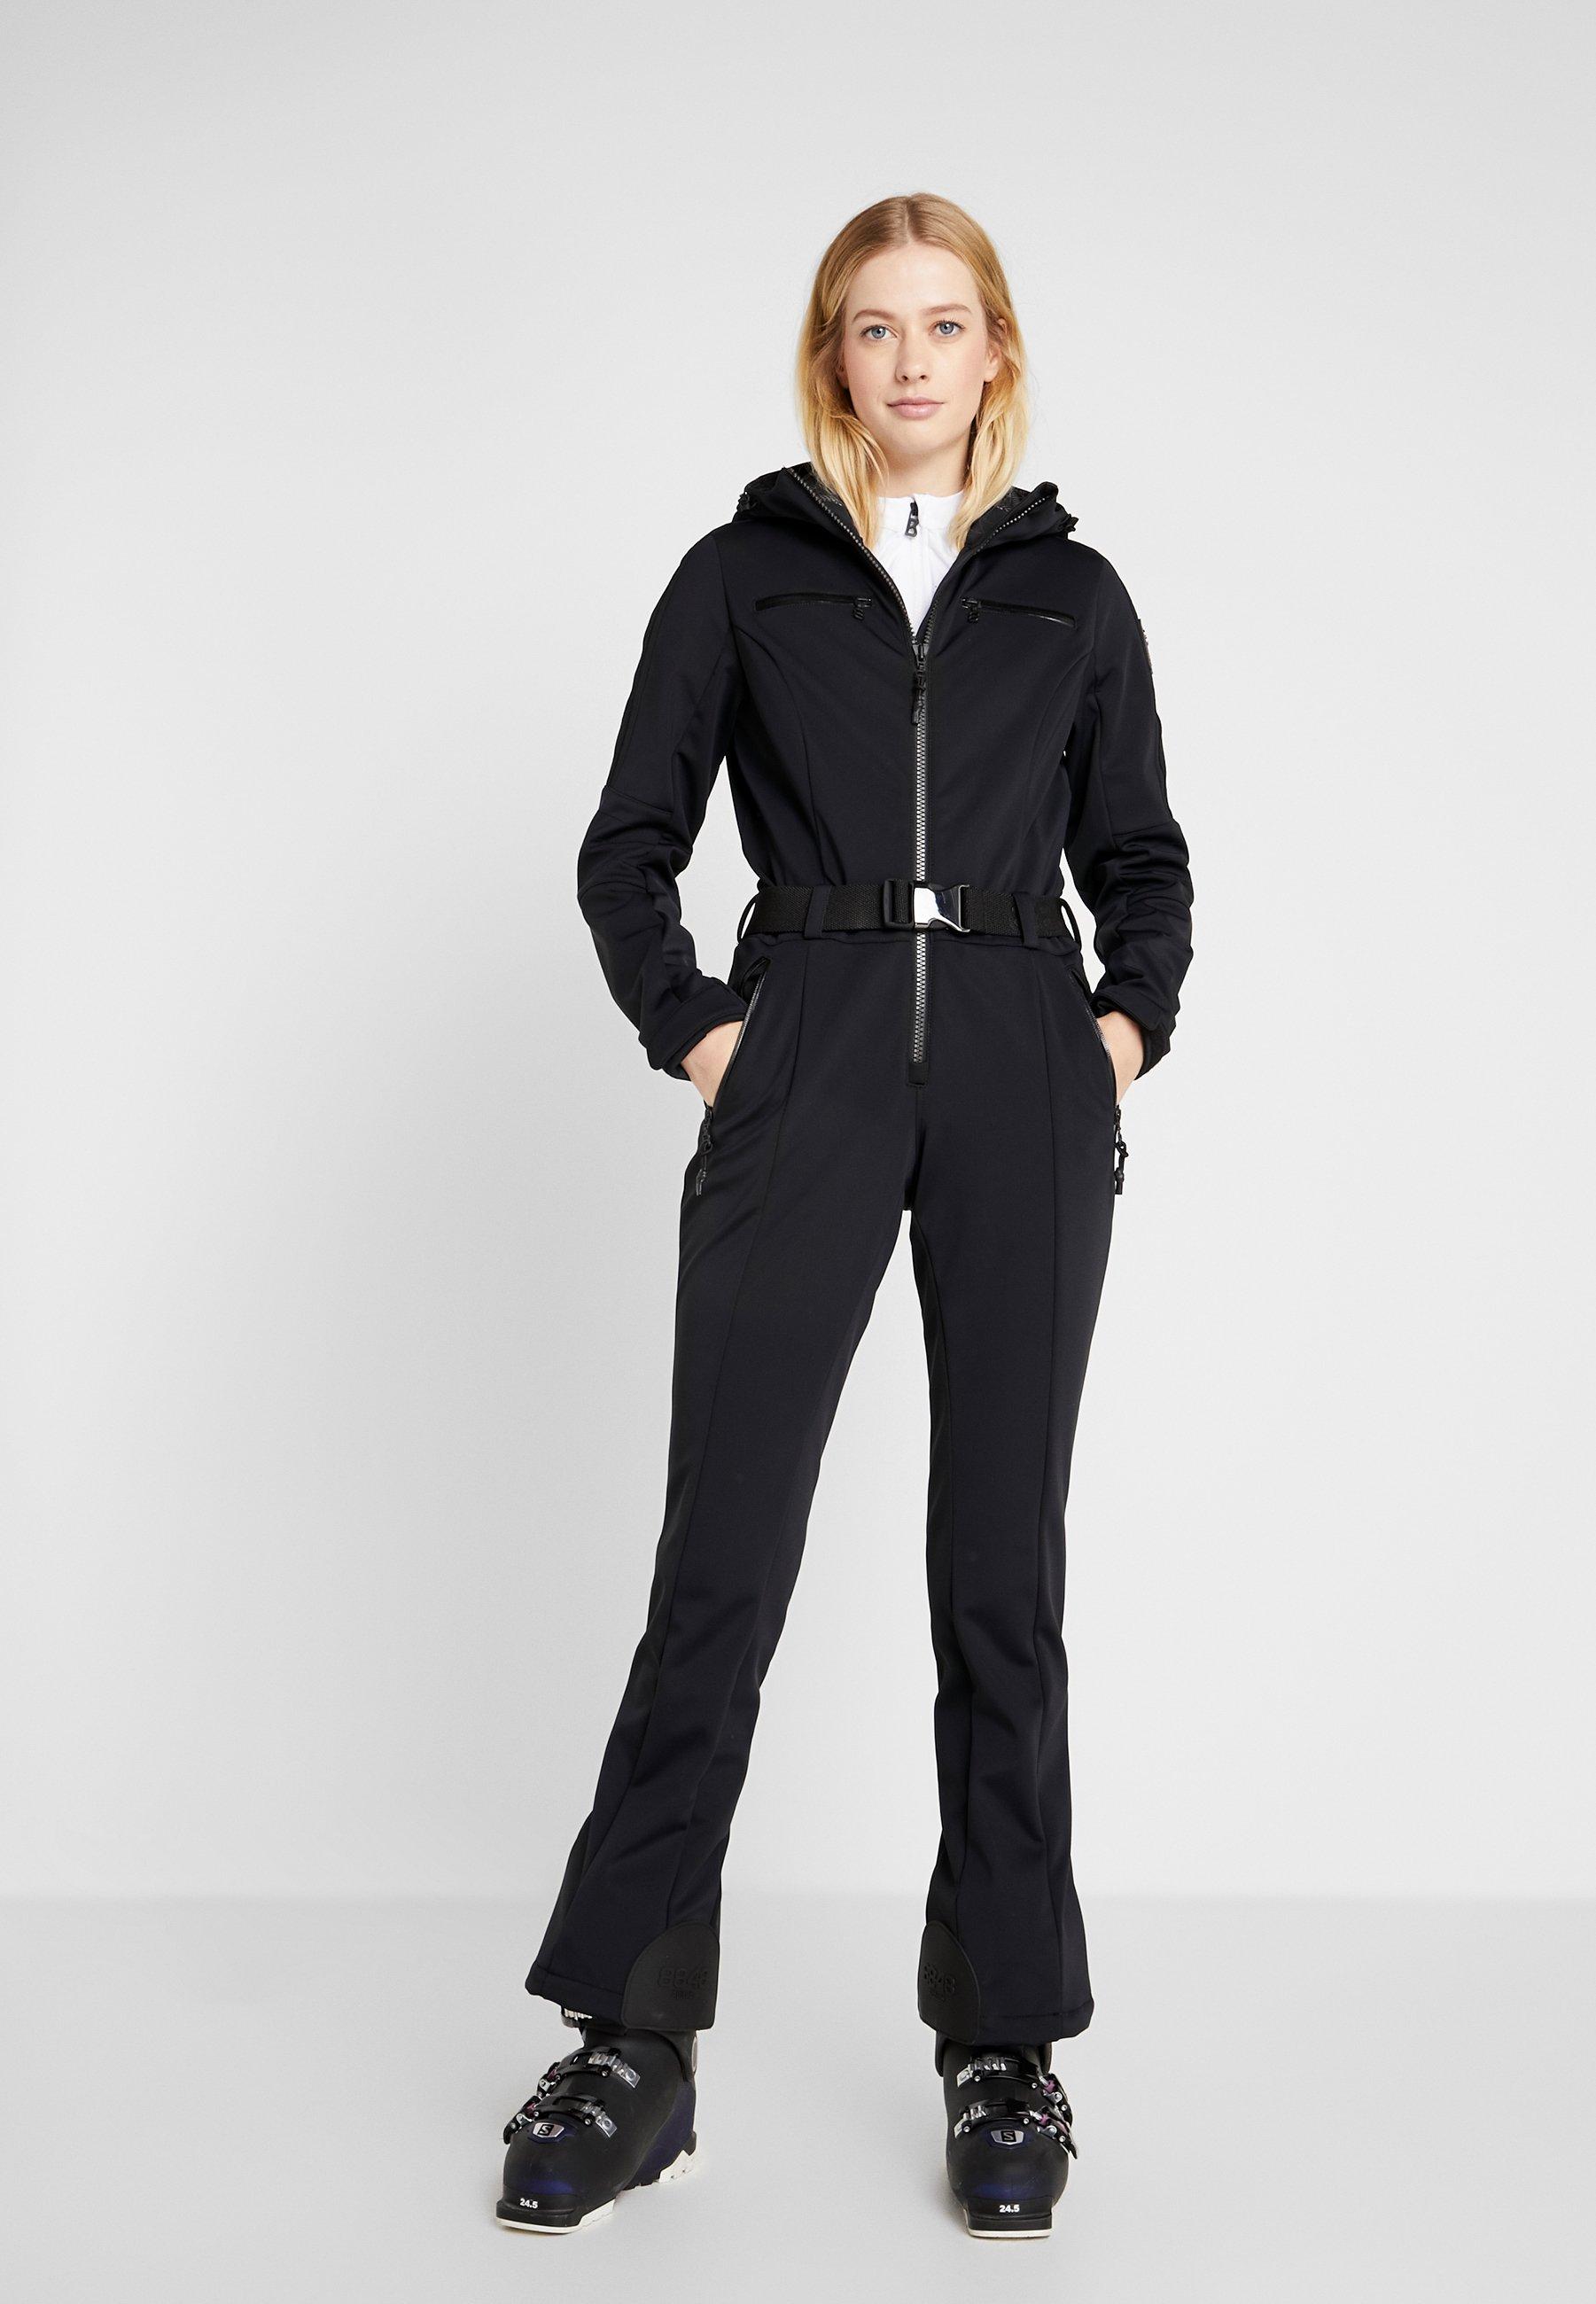 Femme CAT SKI SUIT - Pantalon de ski